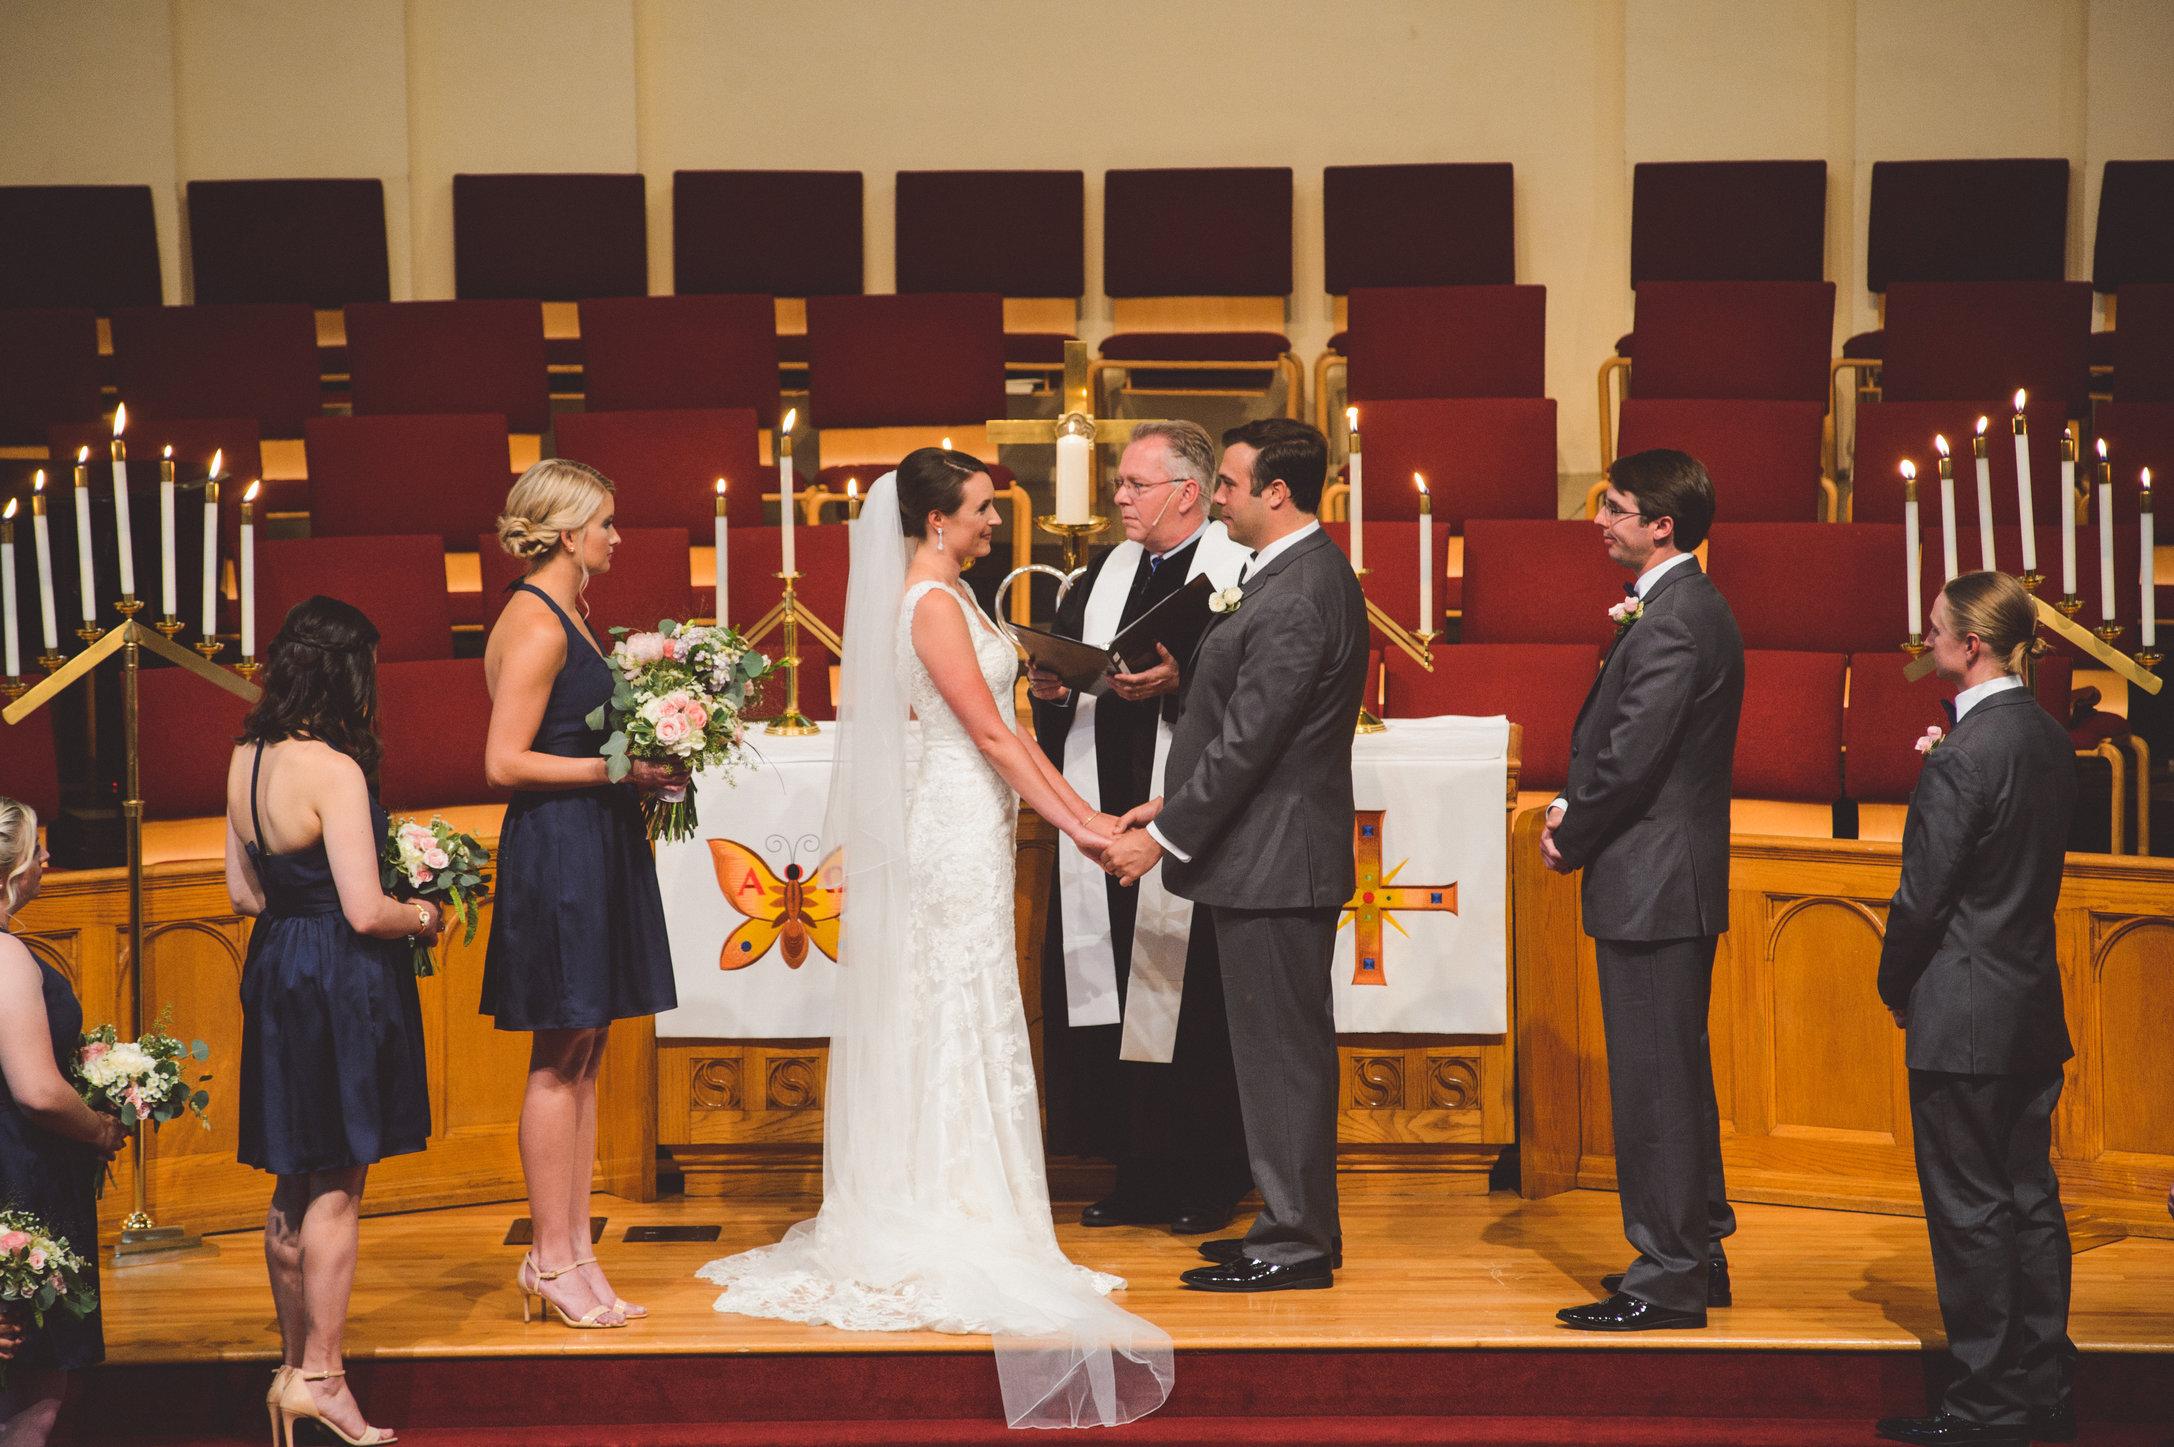 SandC-wedding-194.jpg